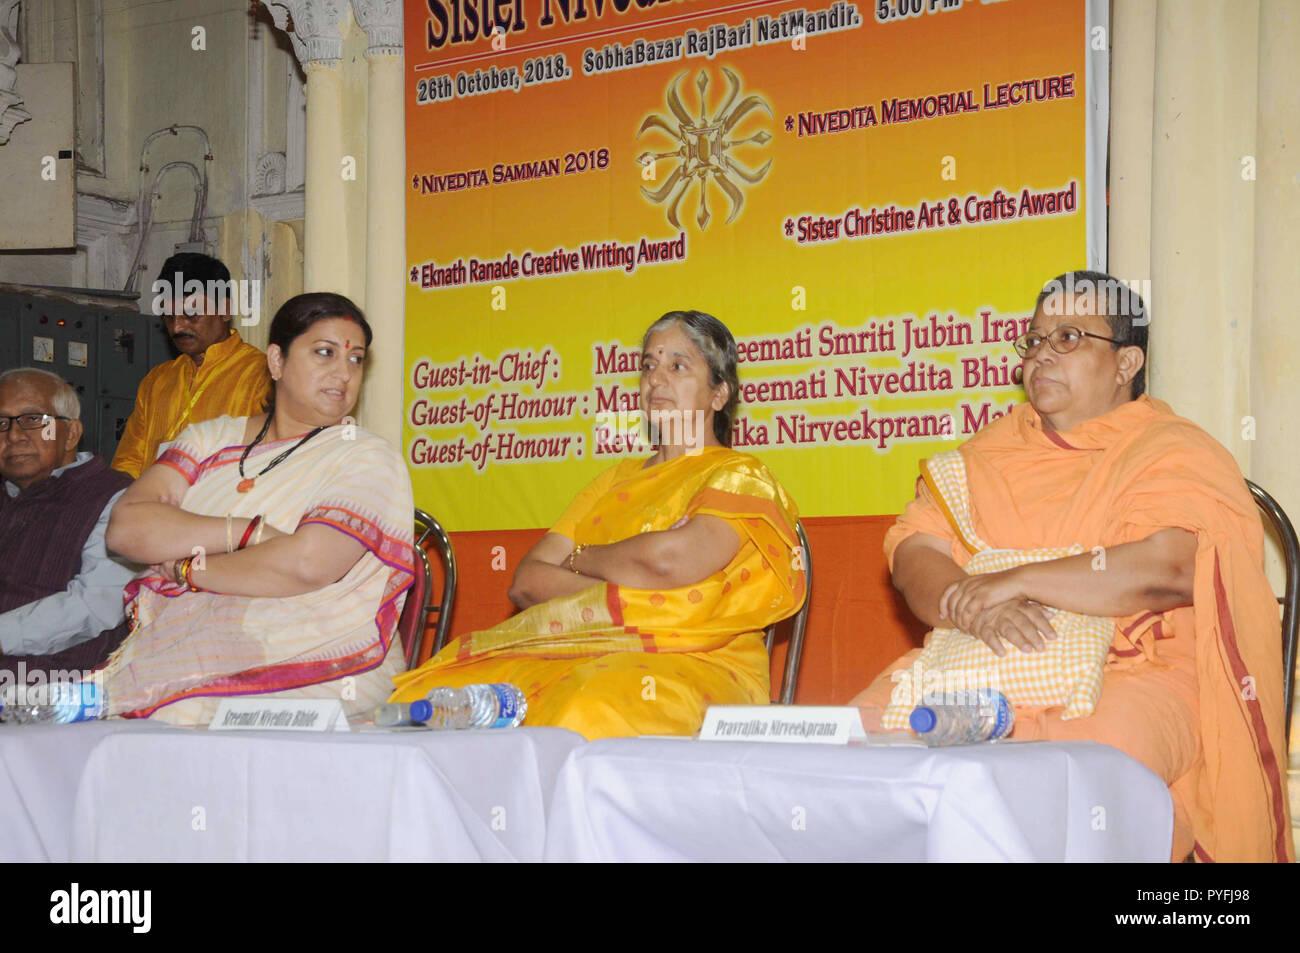 Kolkata, India. 26th Oct, 2018. Union Textile Minister Smriti Irani (left) takes part in the inauguration of Sister Nivedita Memorial Lecture at Sovabazaar Rajbari. Credit: Saikat Paul/Pacific Press/Alamy Live News - Stock Image